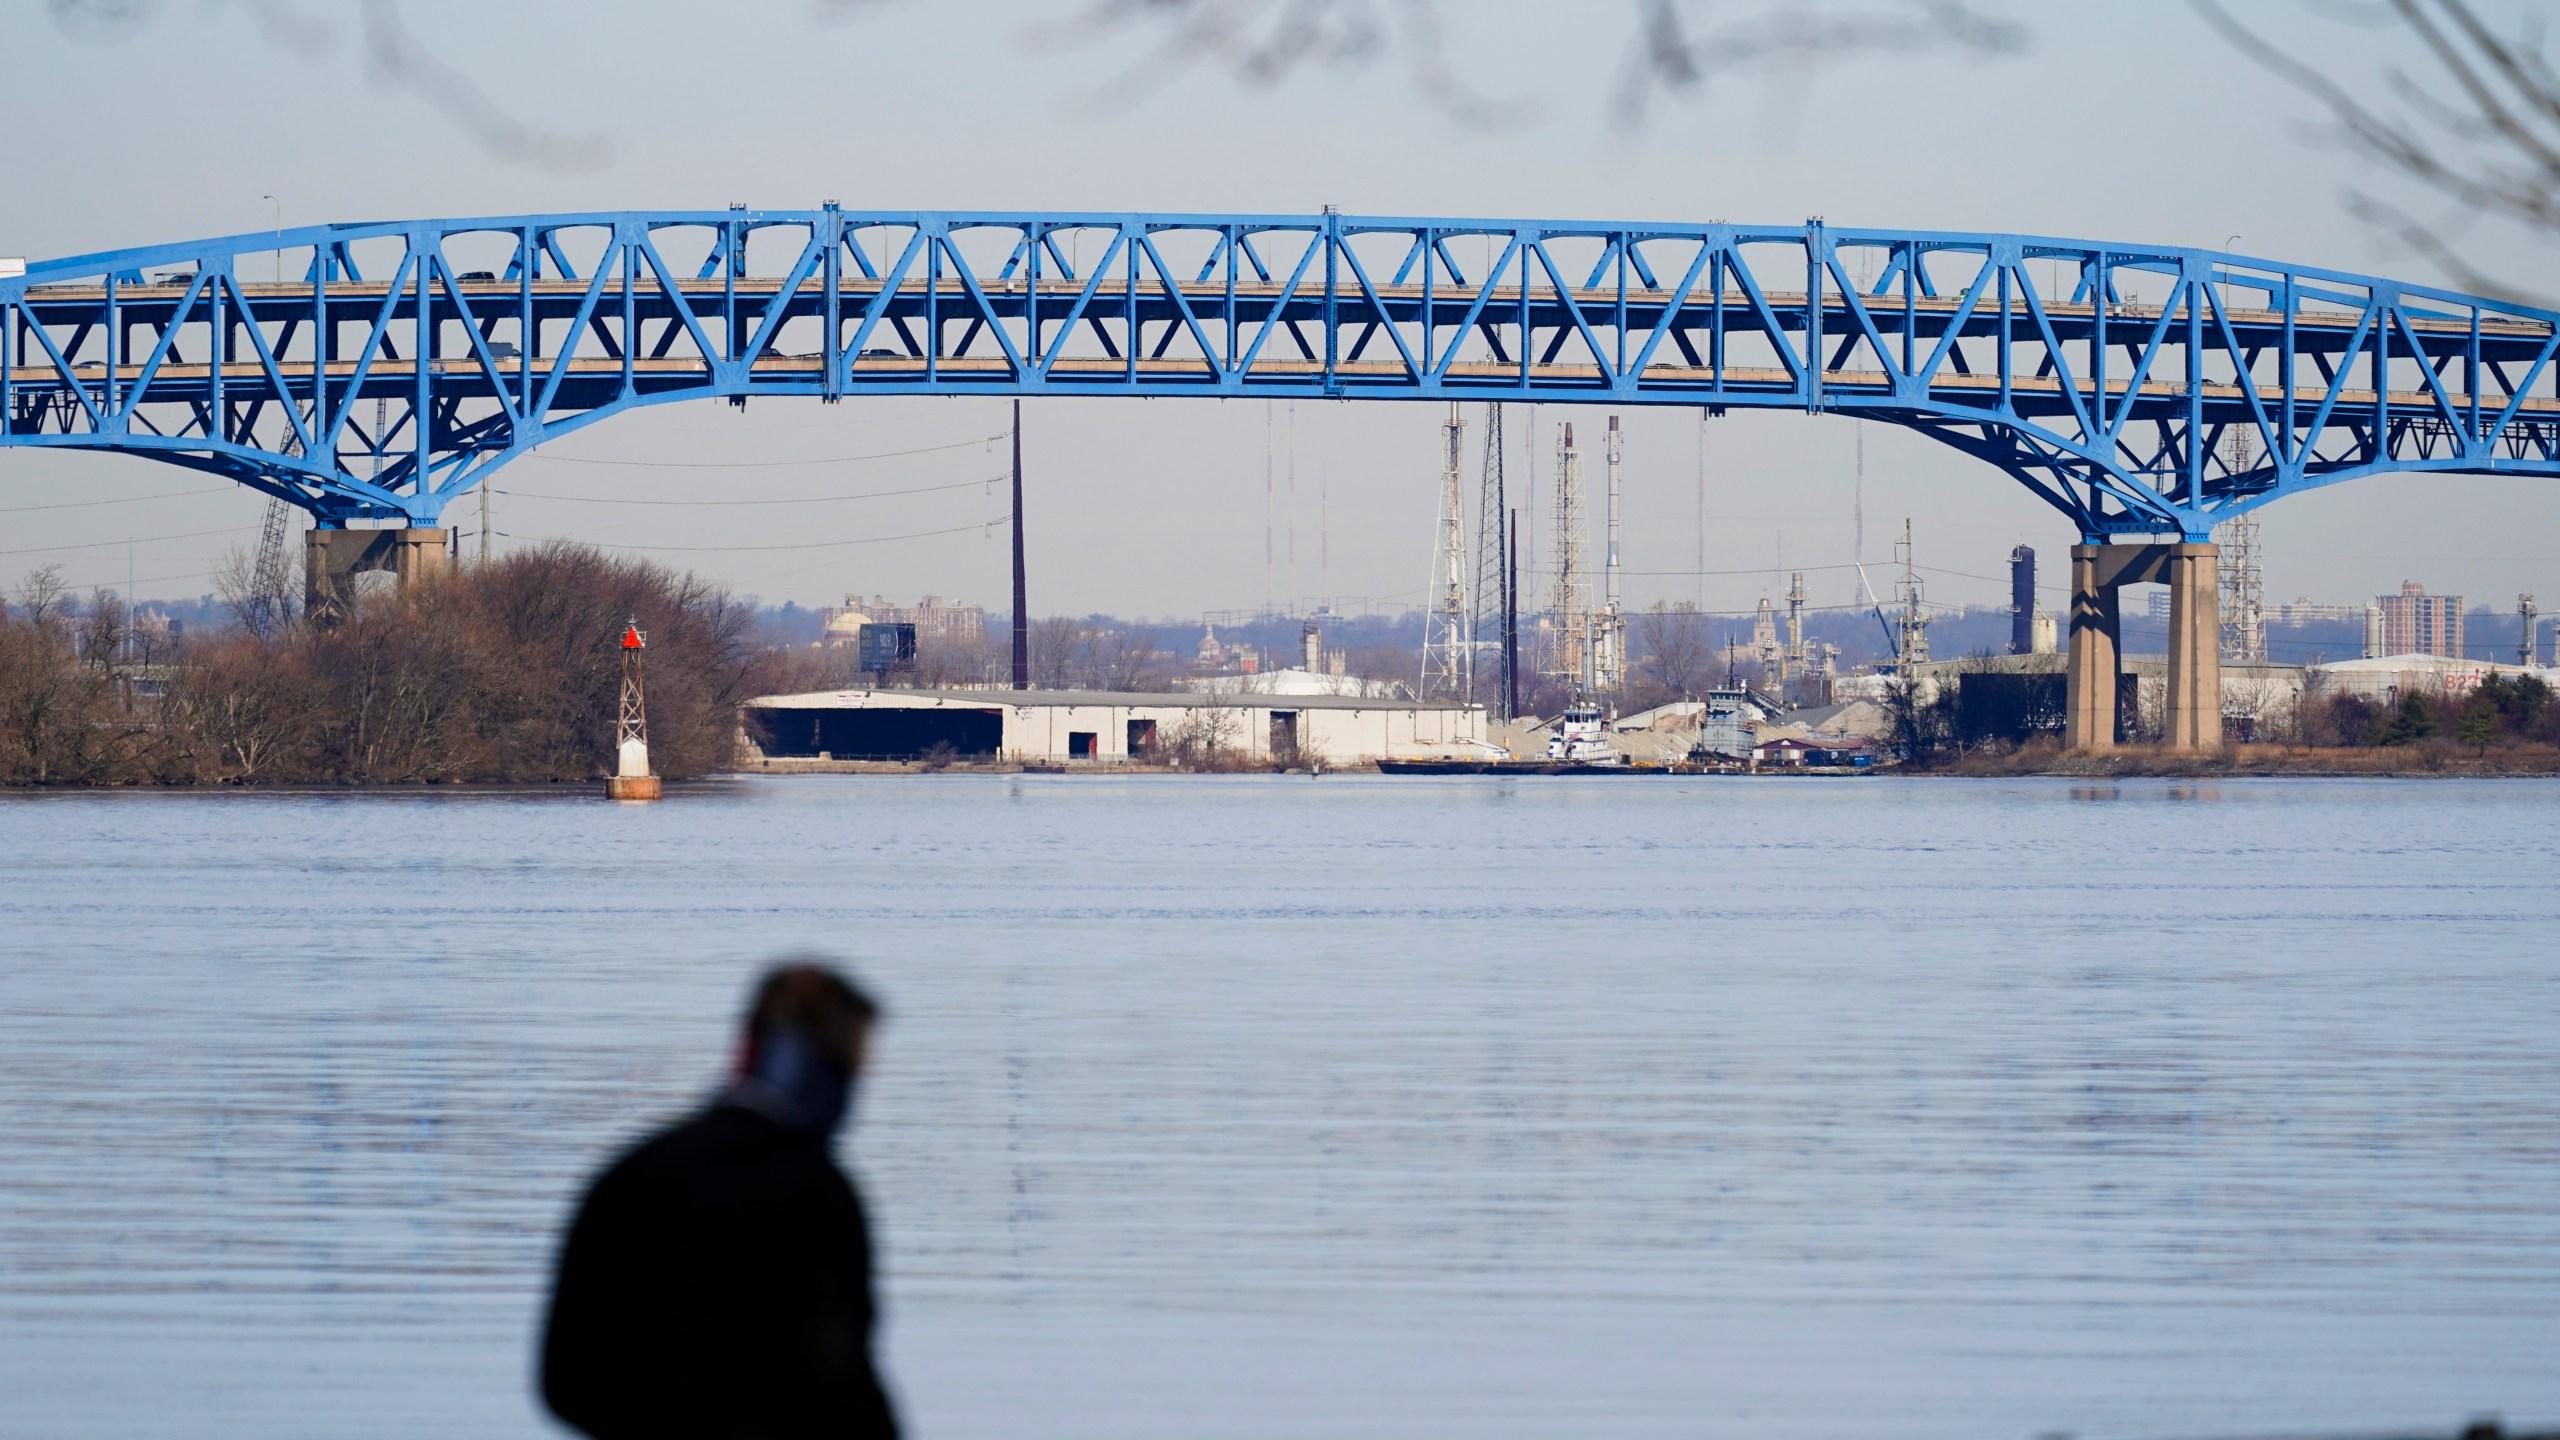 Pa. Senate OKs bill to halt Wolf's bridge tolling plan